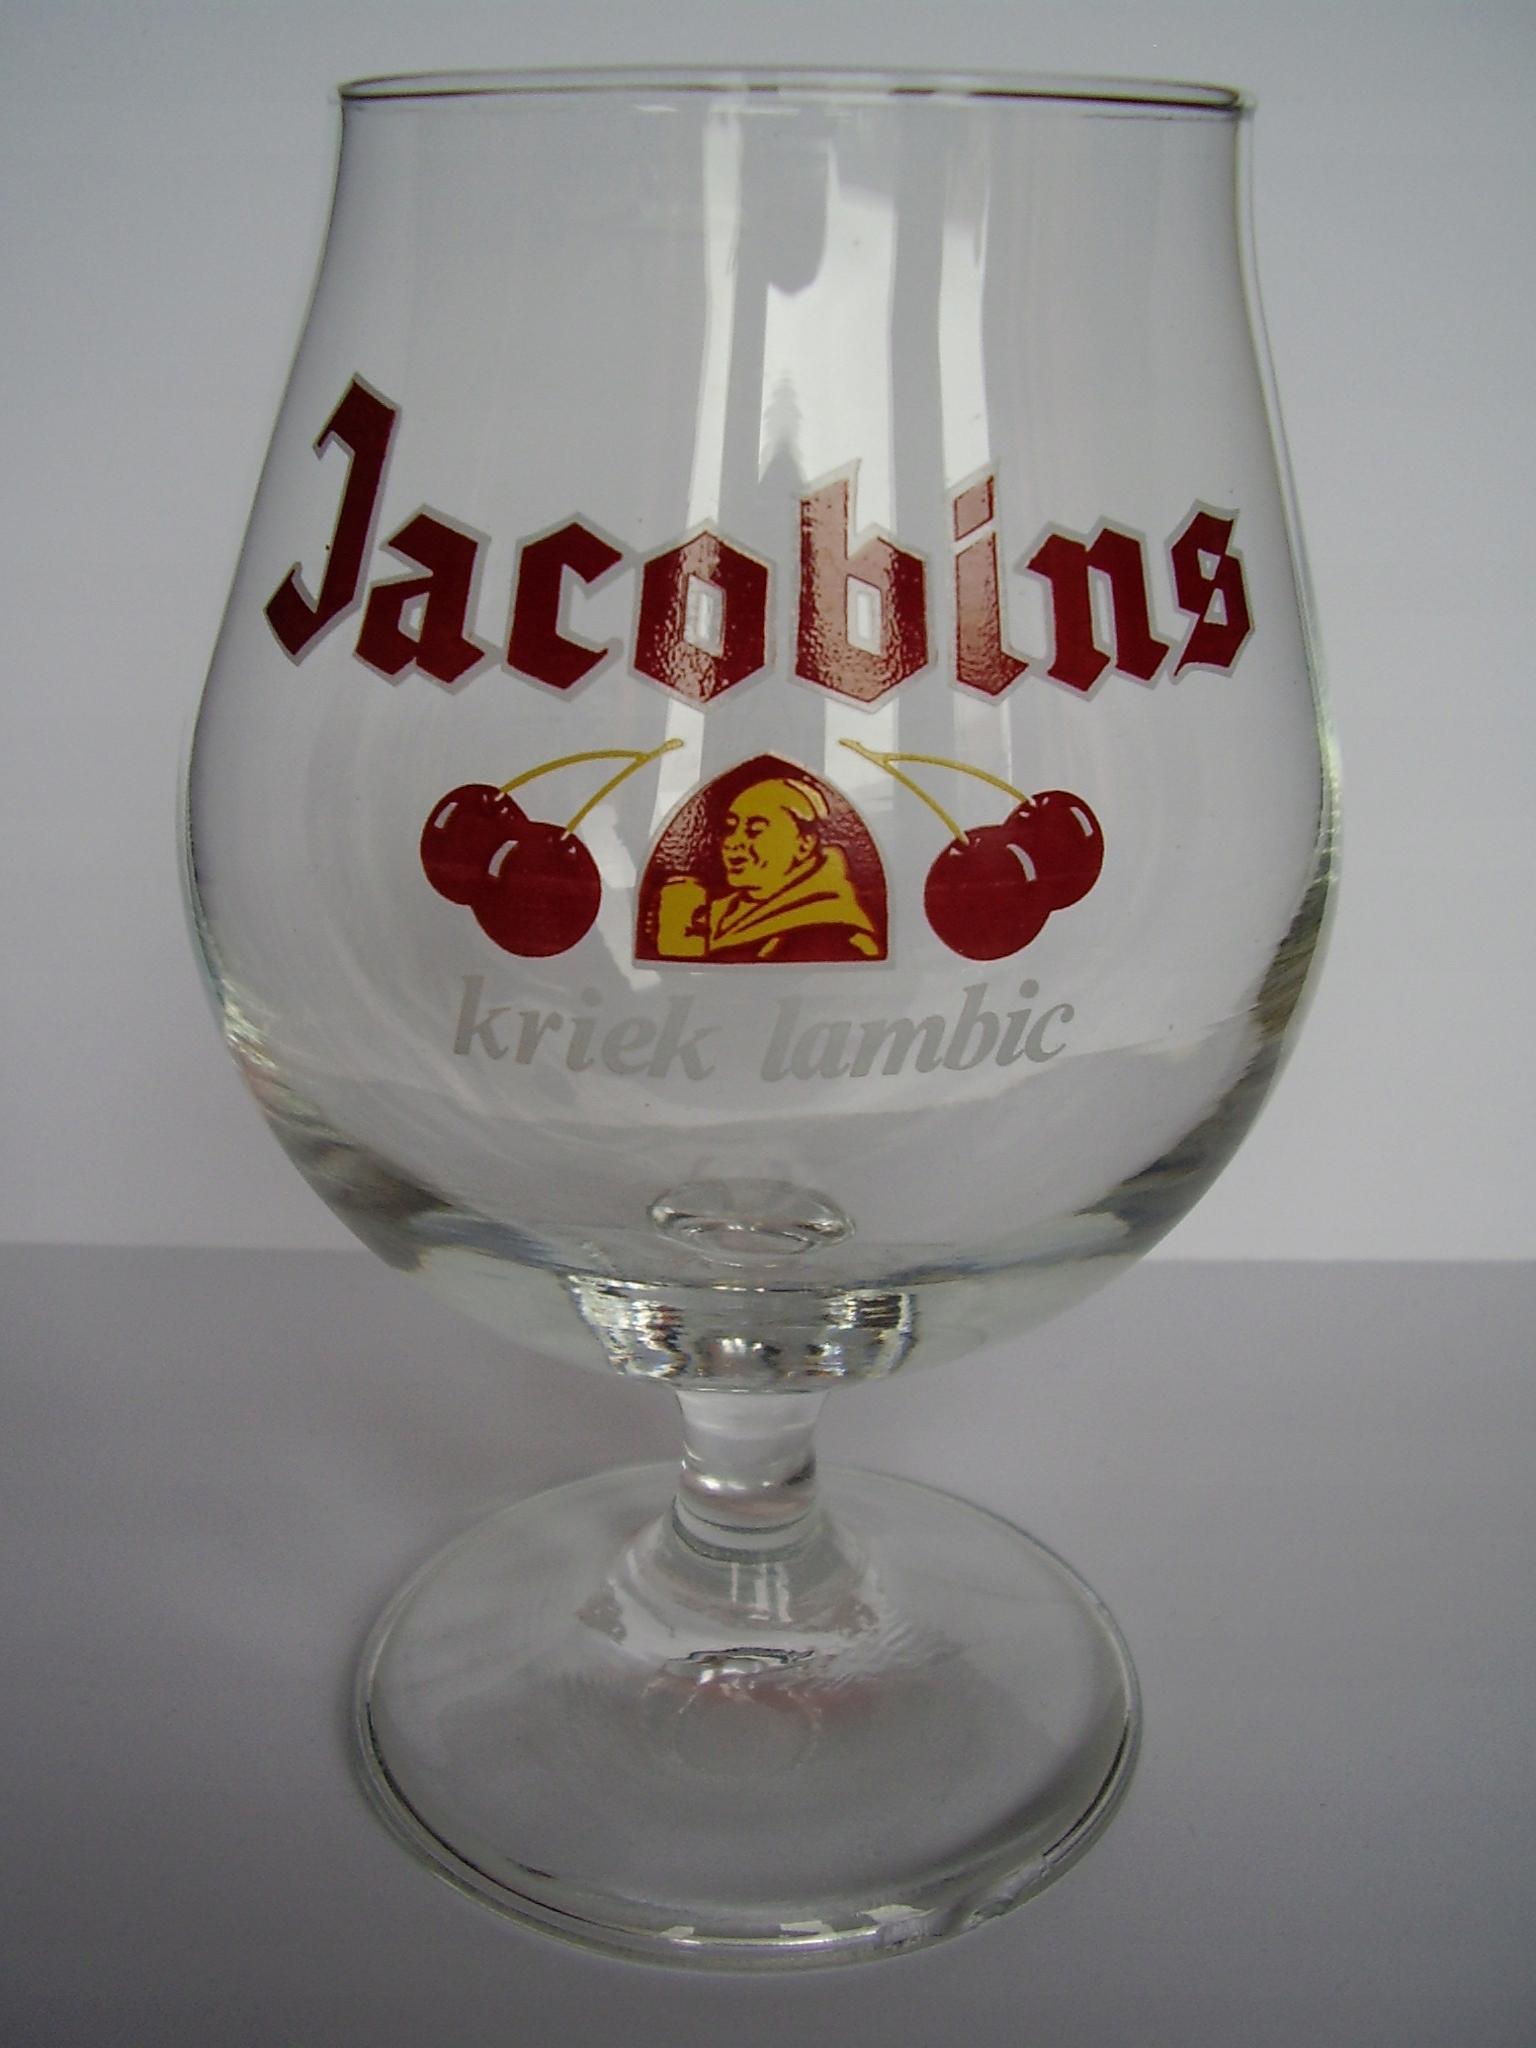 Jacobins - pokal 0,33L (Belgia)